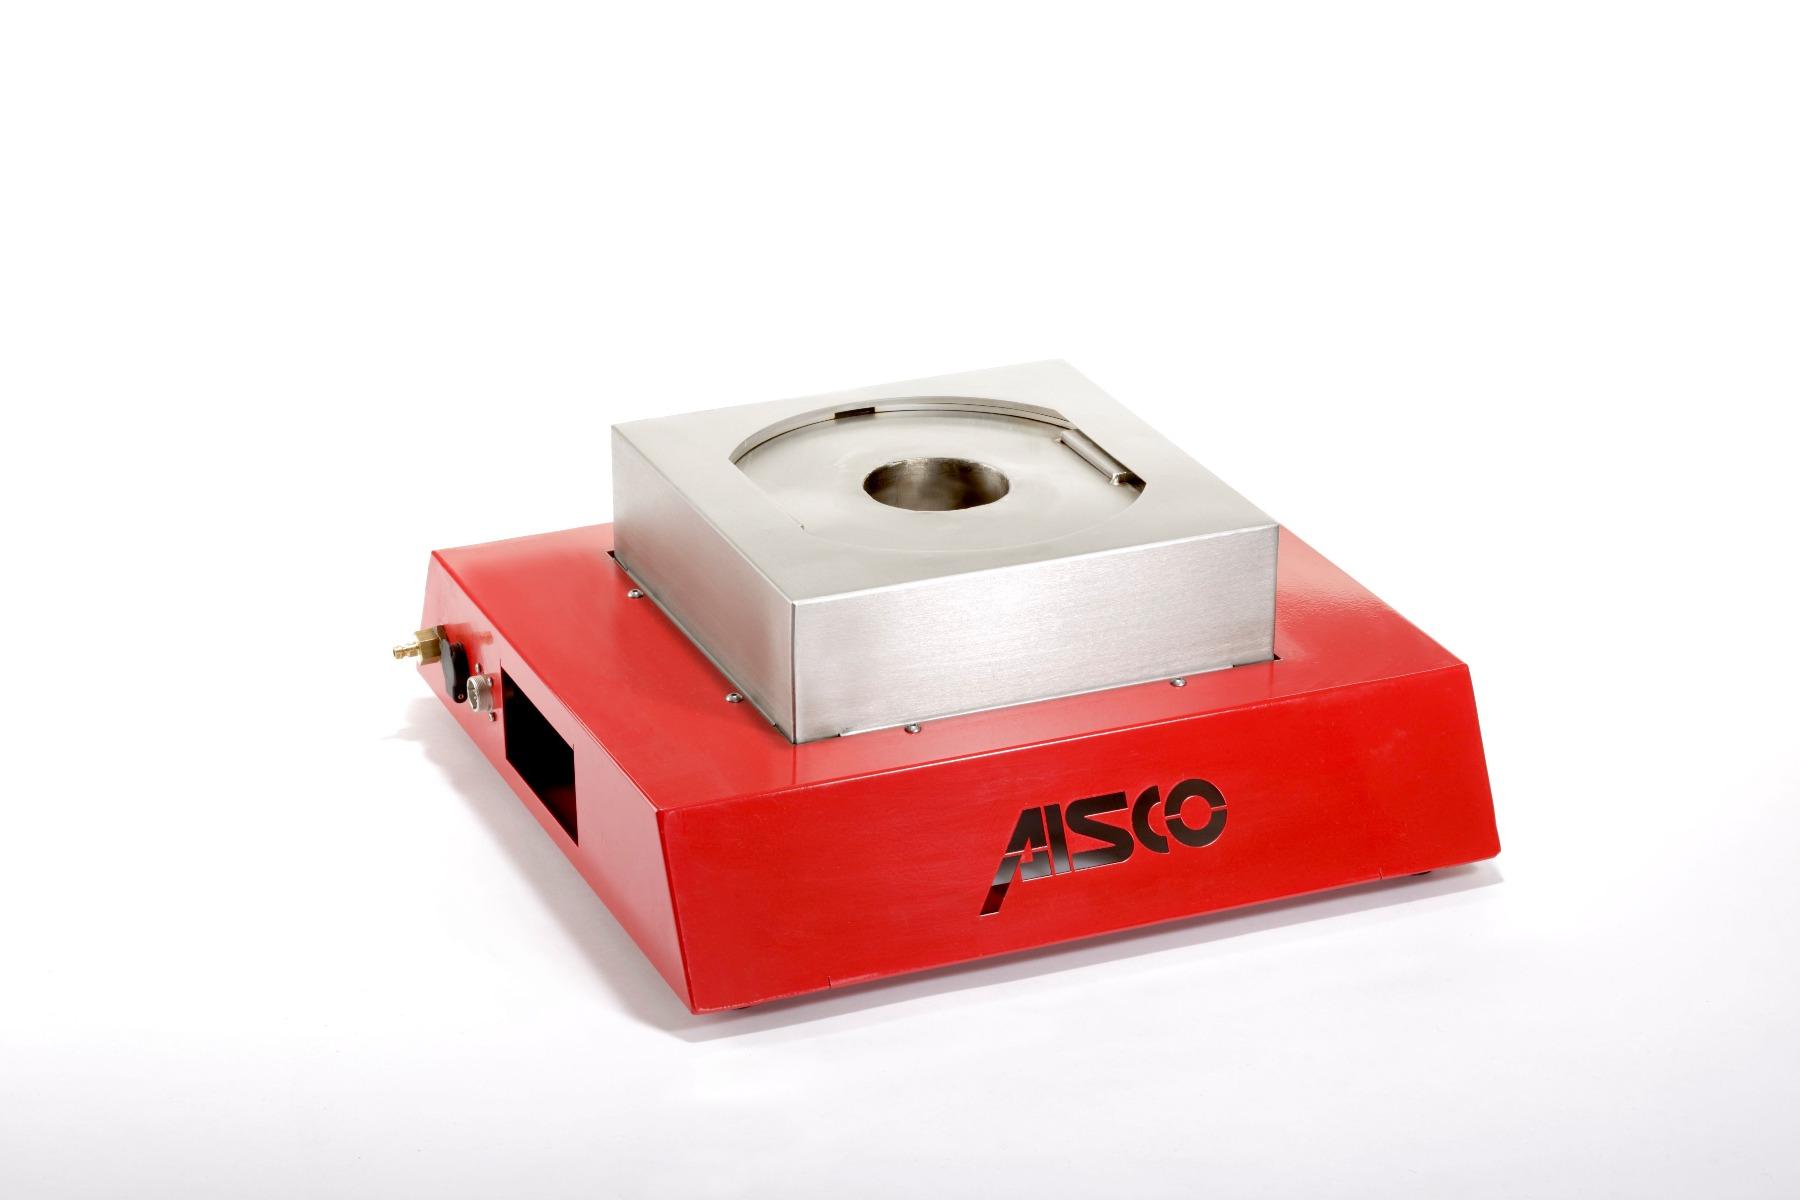 AISCO Firetrainer UL 1  AKTIONSPREIS